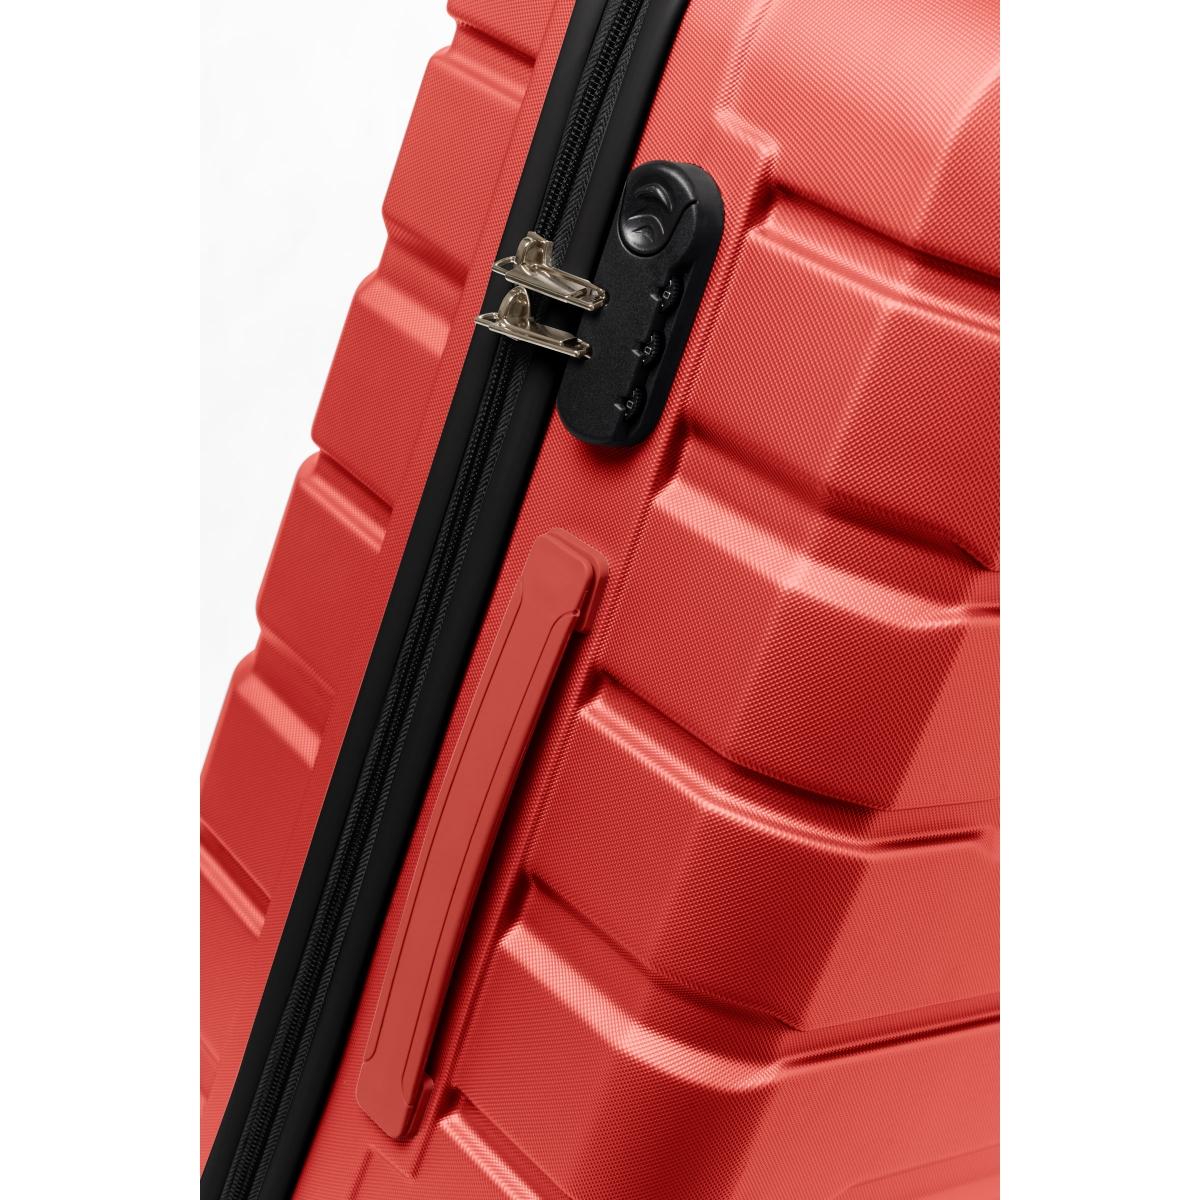 Gedox Abs Premium Tonaton 3'lü Valiz Seyahat Seti - Model:500.14 Kırmızı